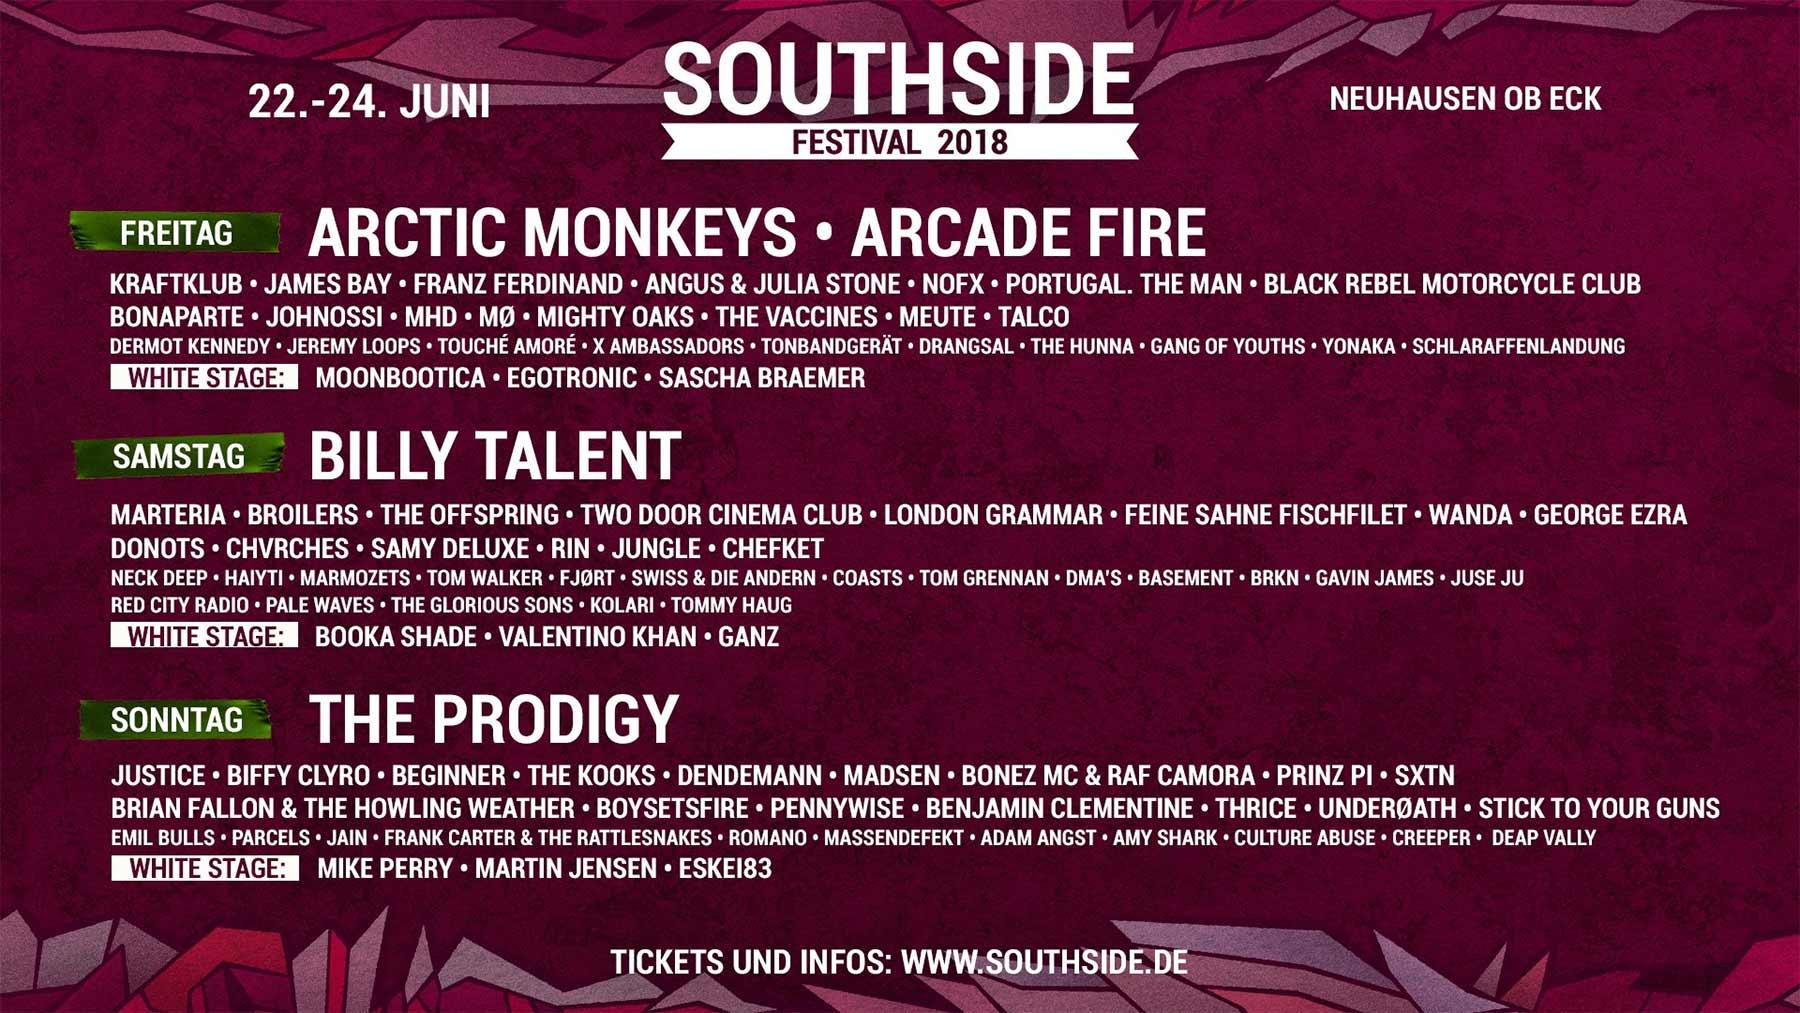 Ich verlose 2x2 Tickets für das Southside Festival 2018 southside-festival-2018-lineup